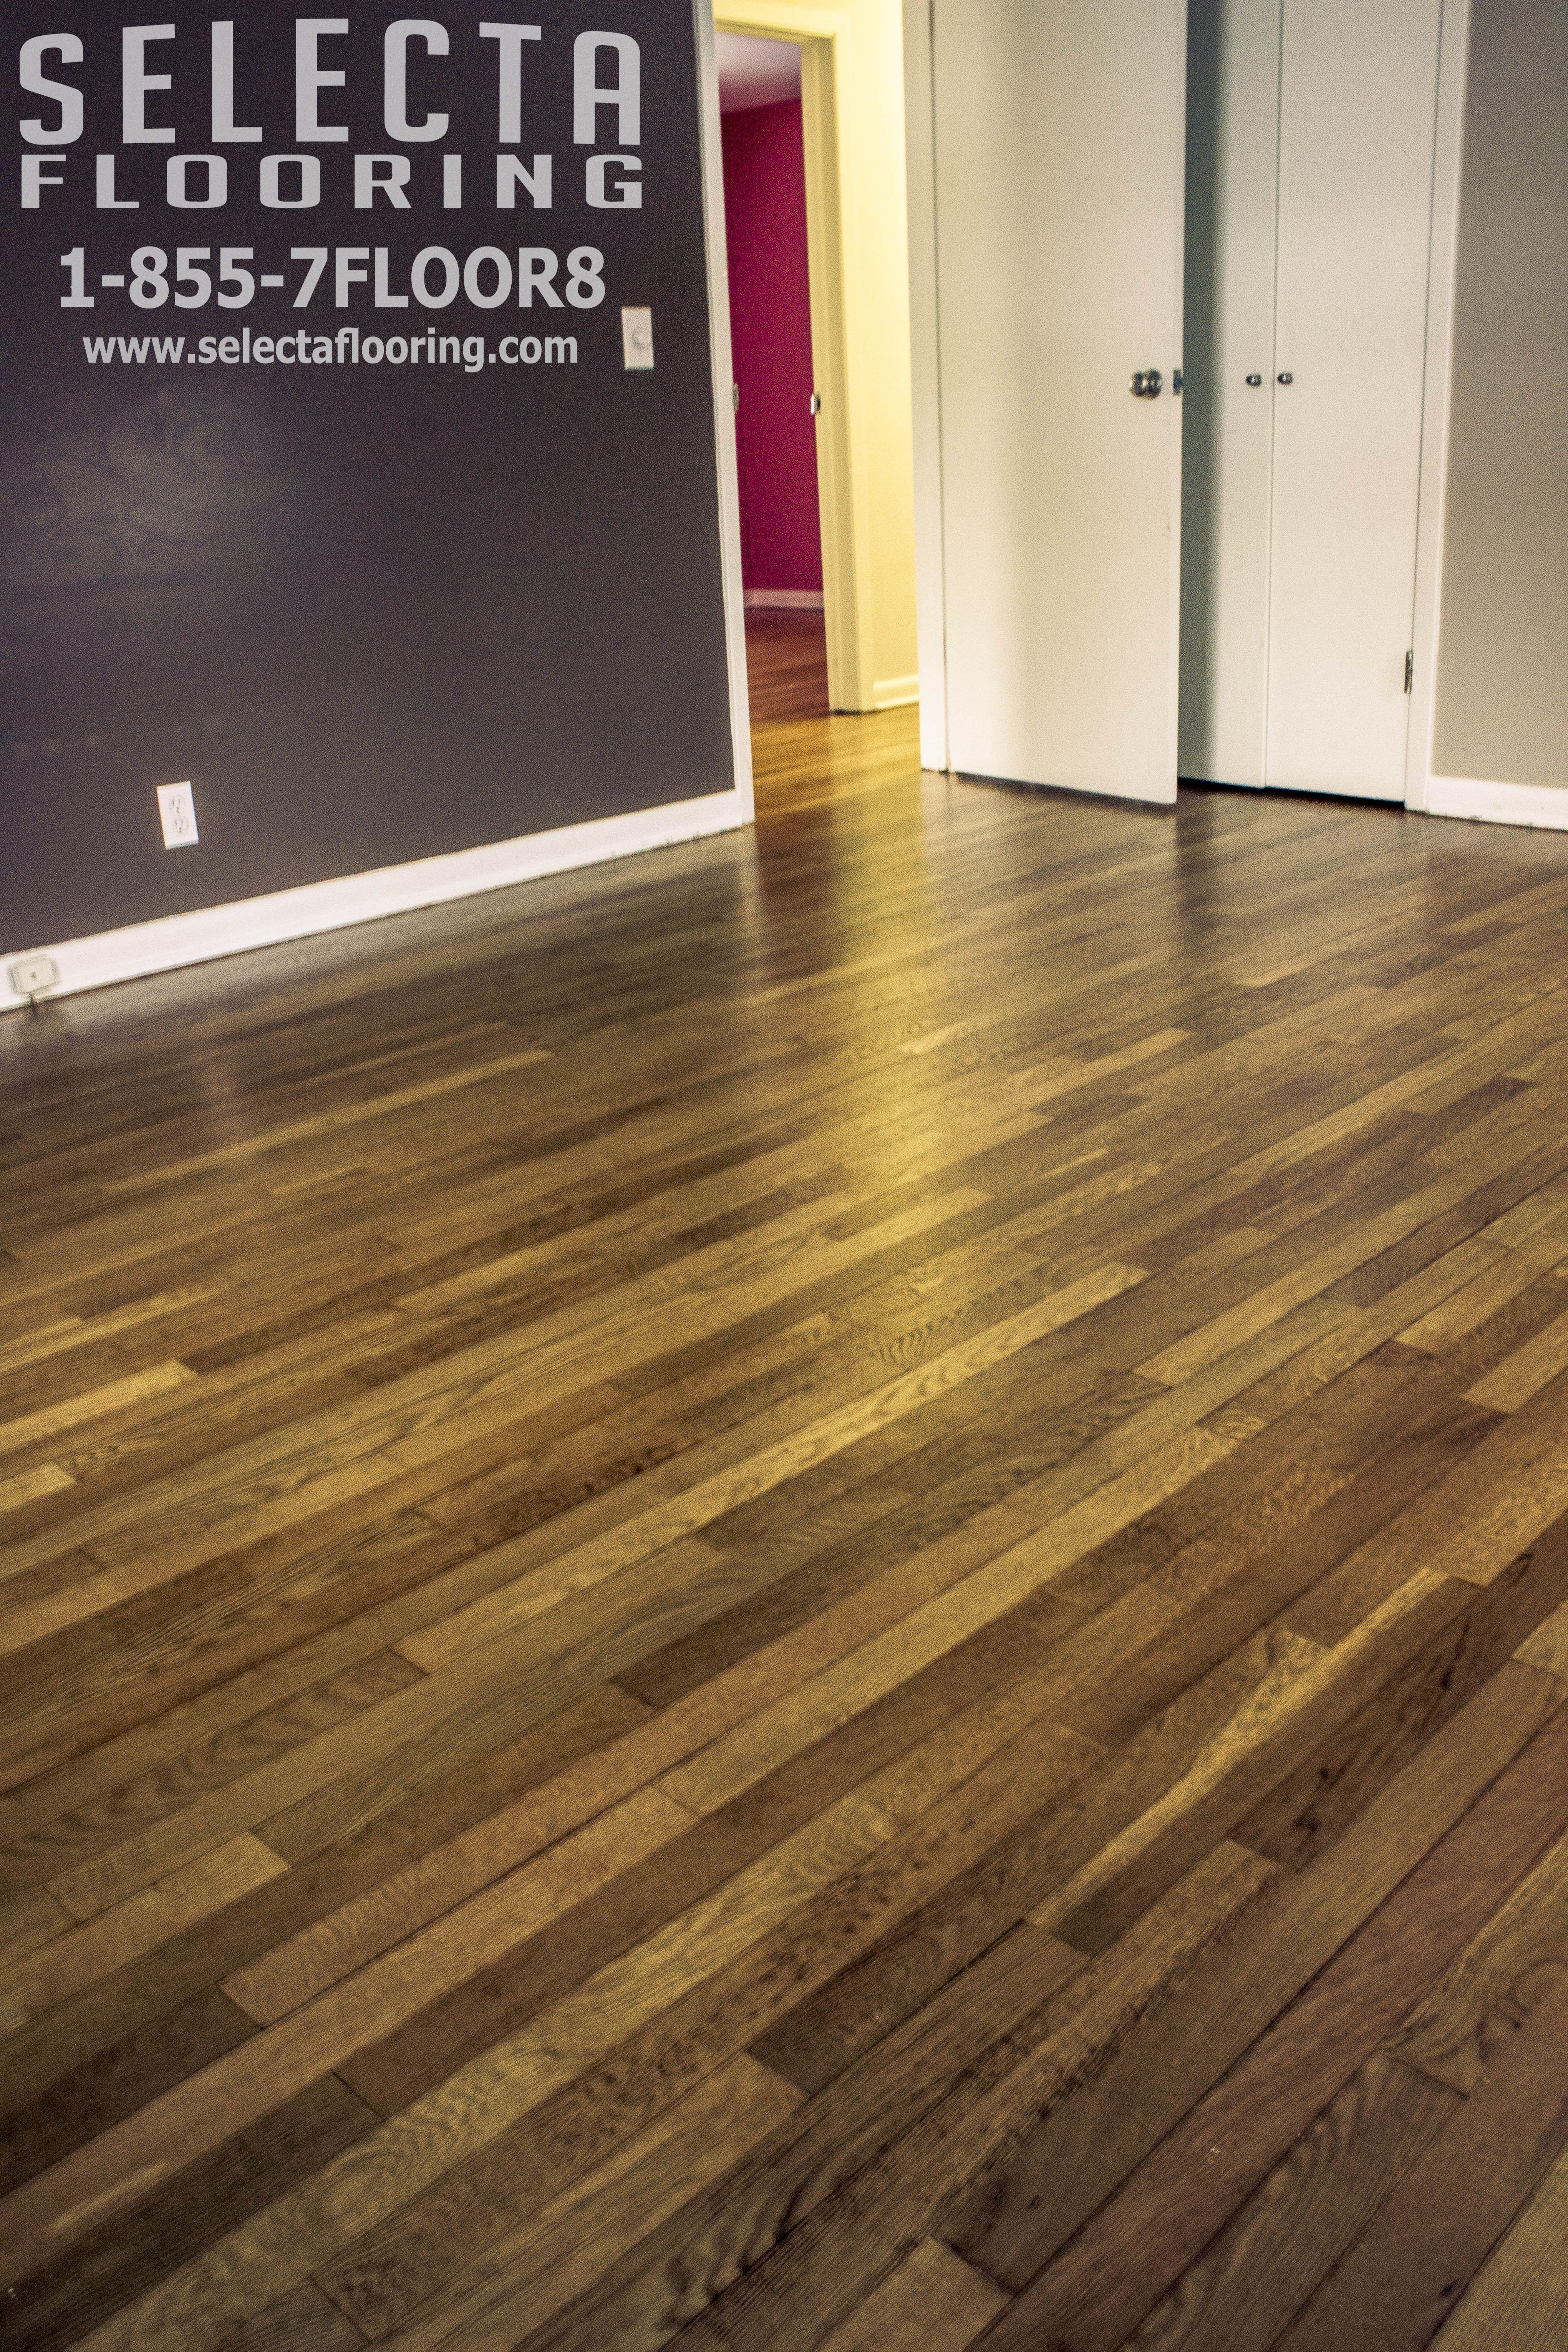 Duraseal Stain Golden Oak Flooring Hardwood Floors